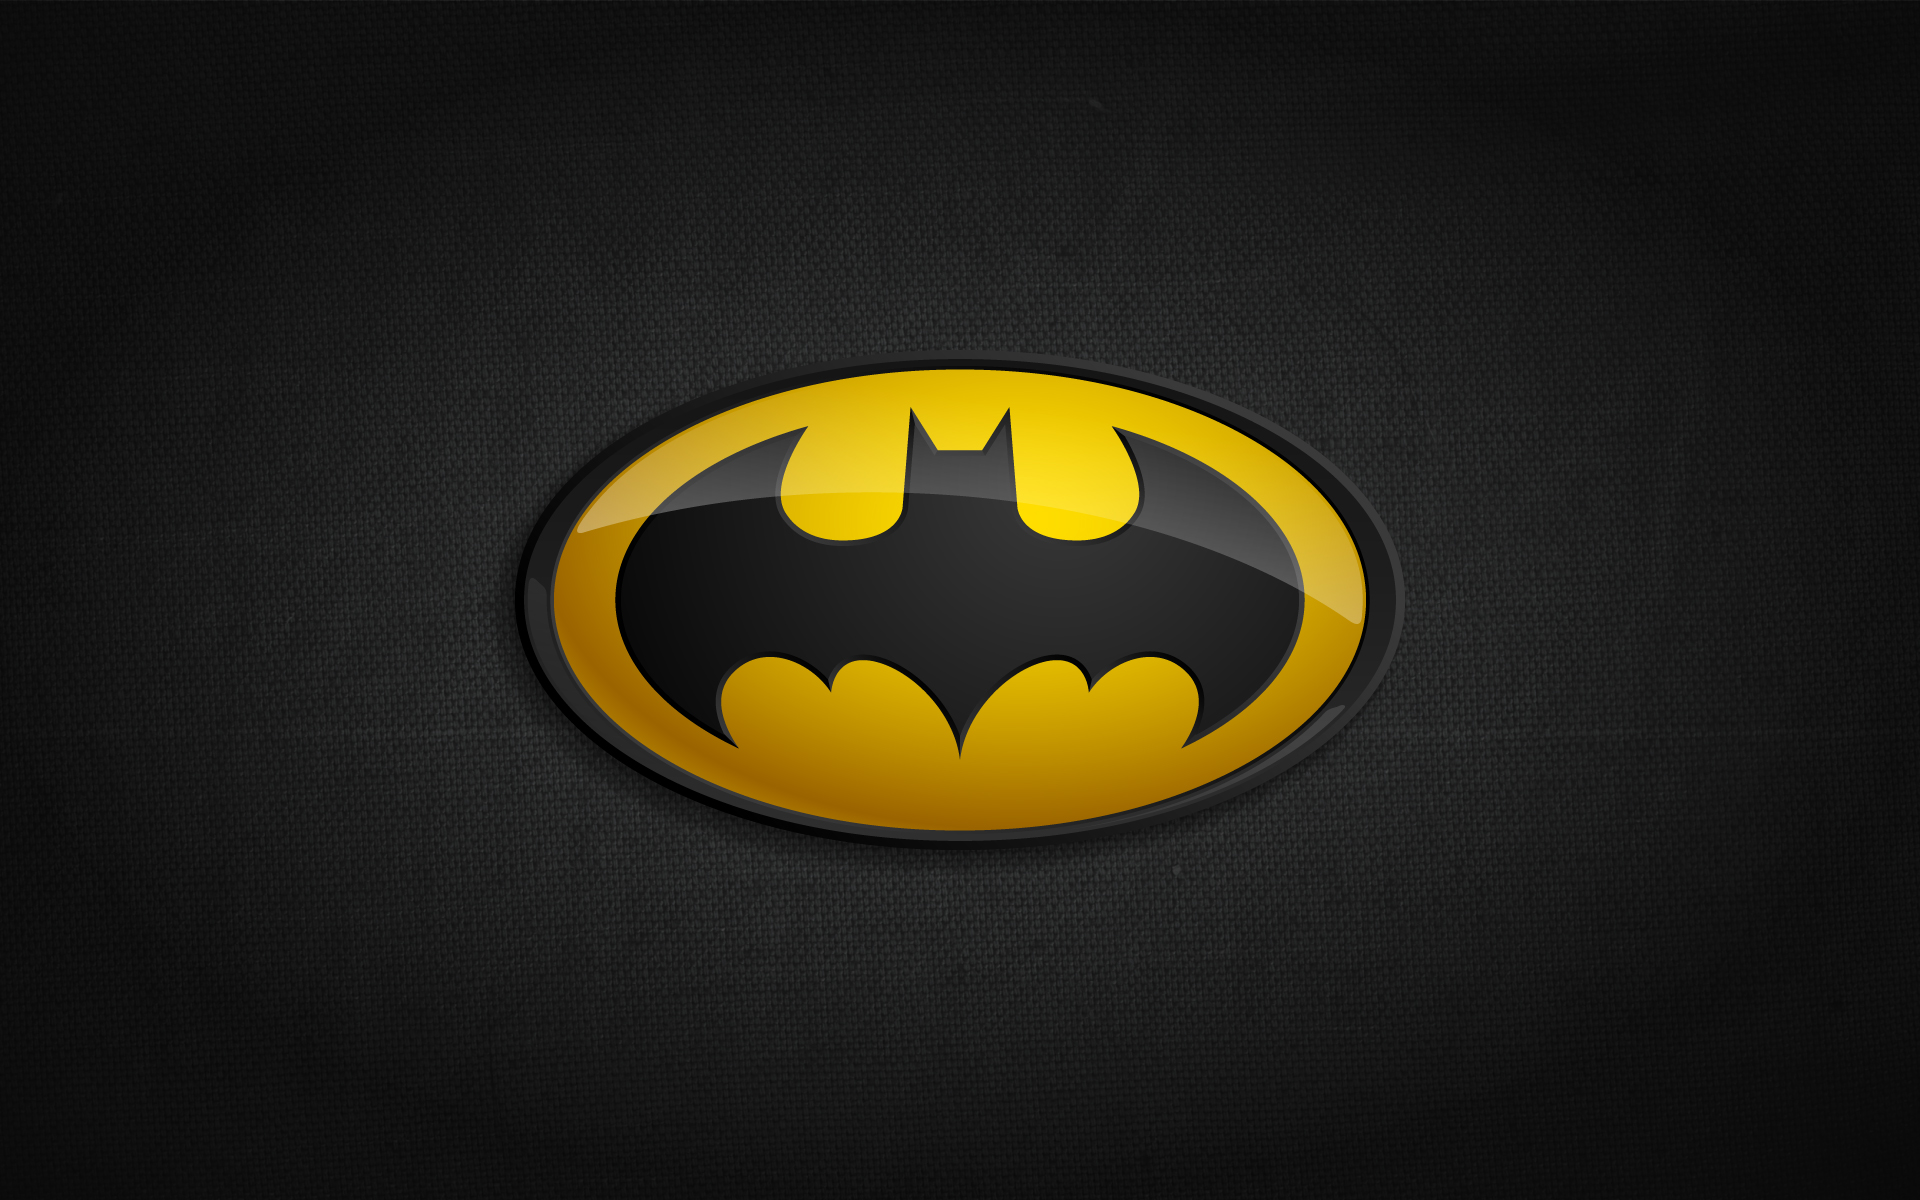 Free download Batman Wallpapers HD Bonus[ DC Marvel MK